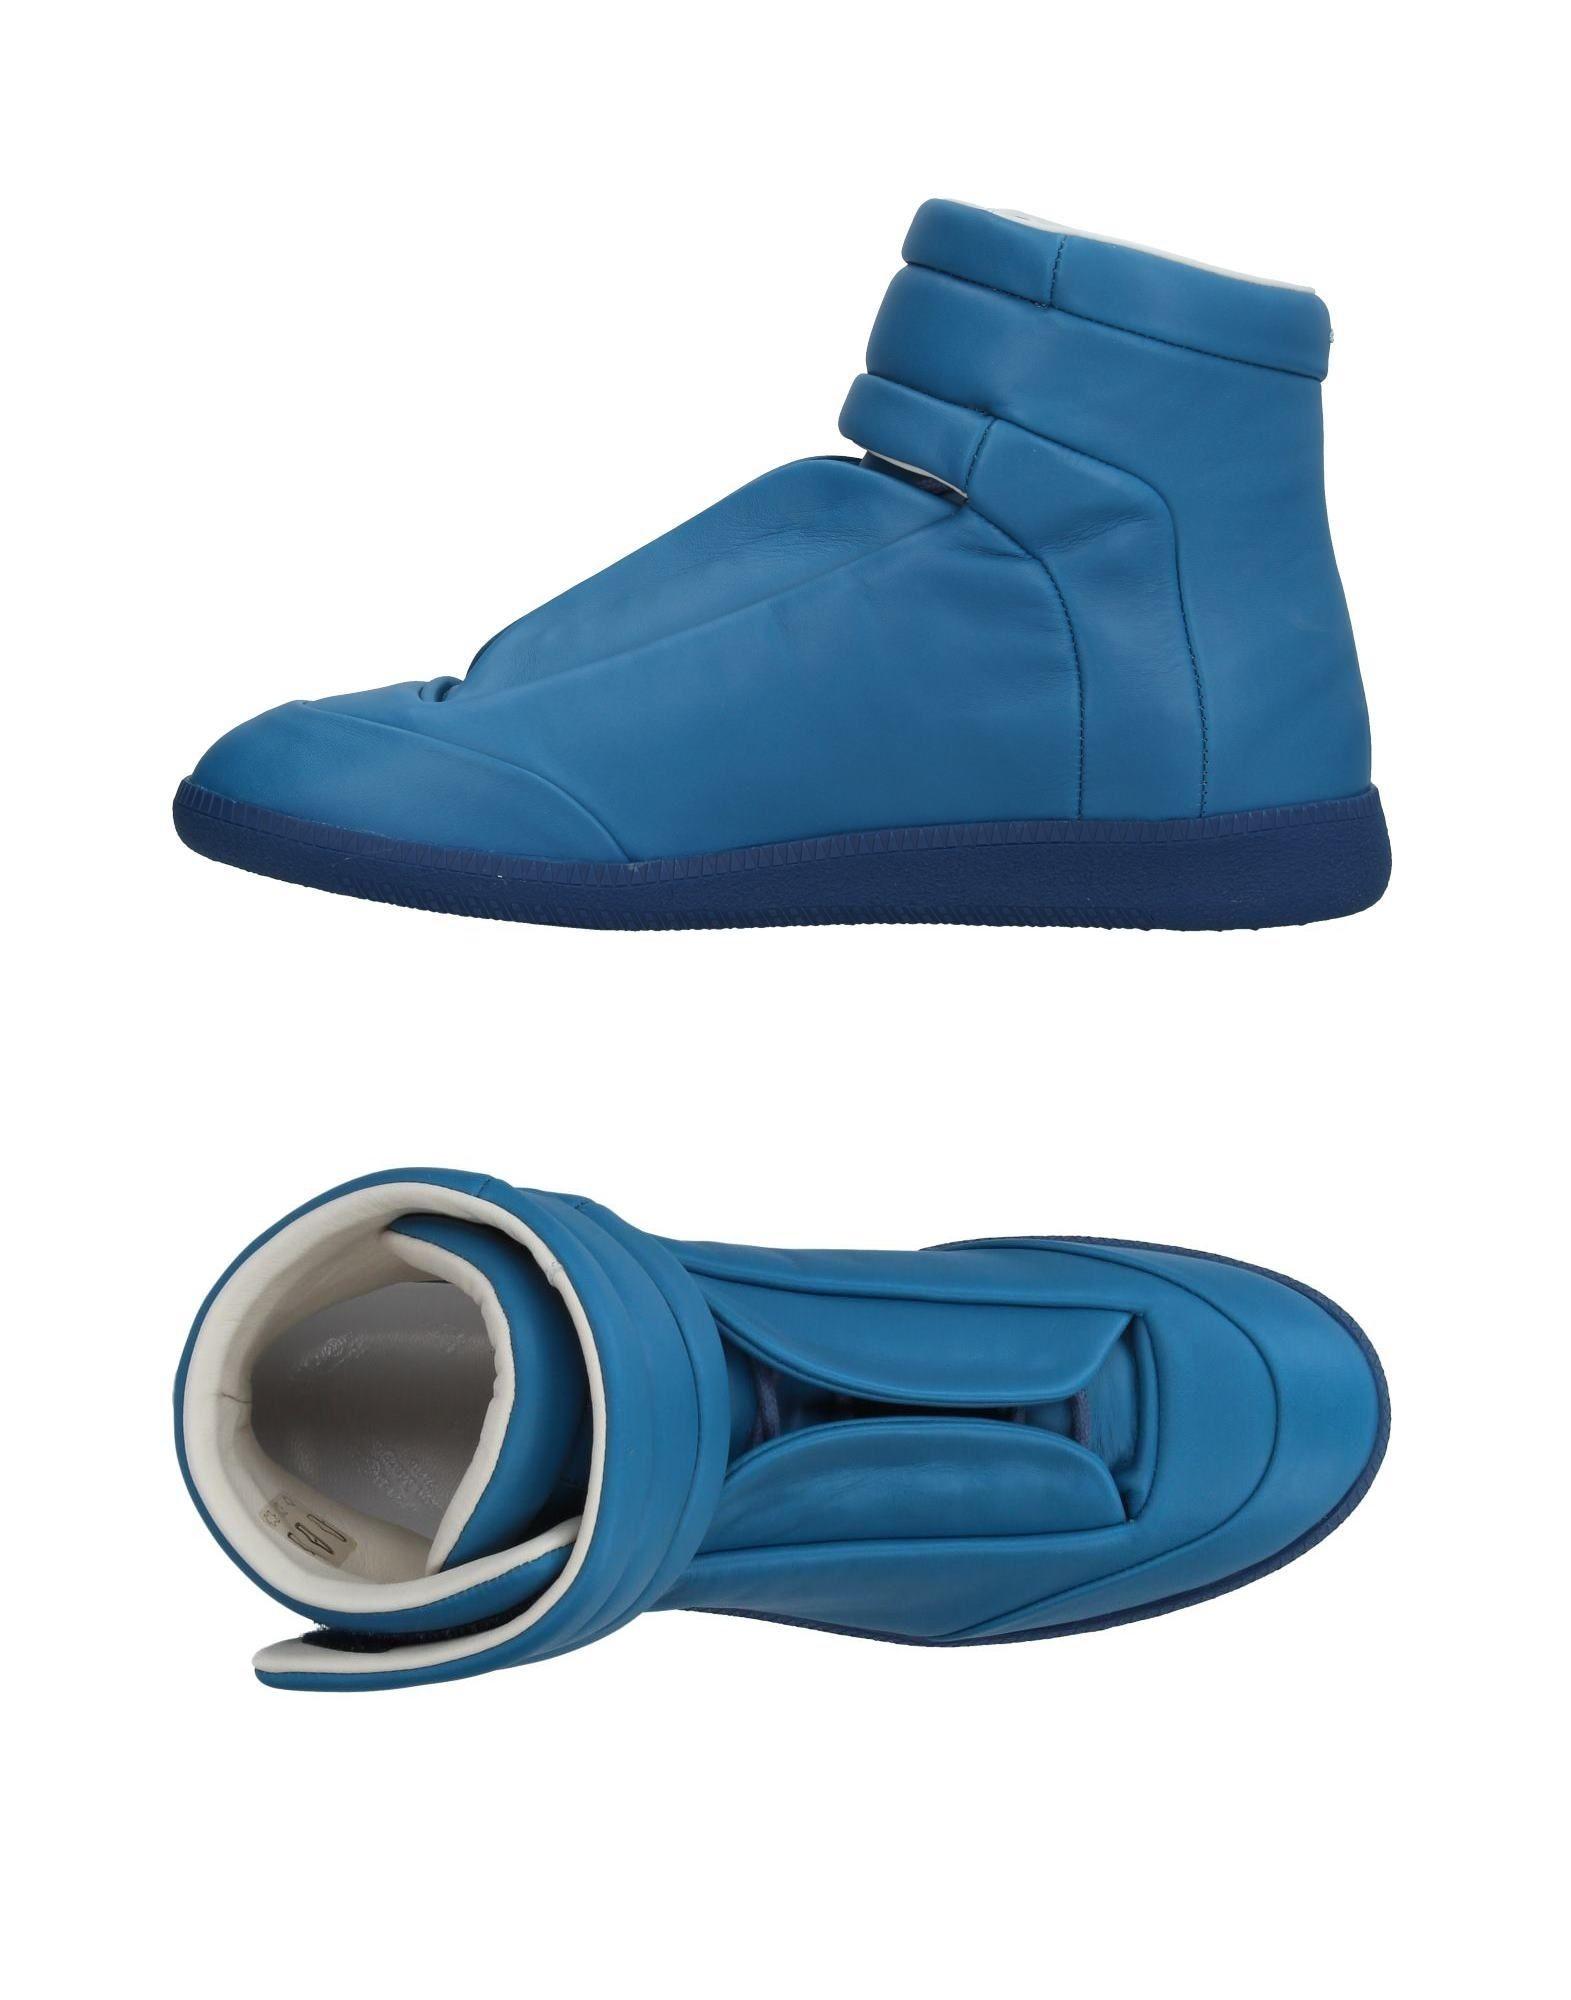 Maison Margiela Sneakers Herren  11114964KE Gute Qualität beliebte Schuhe